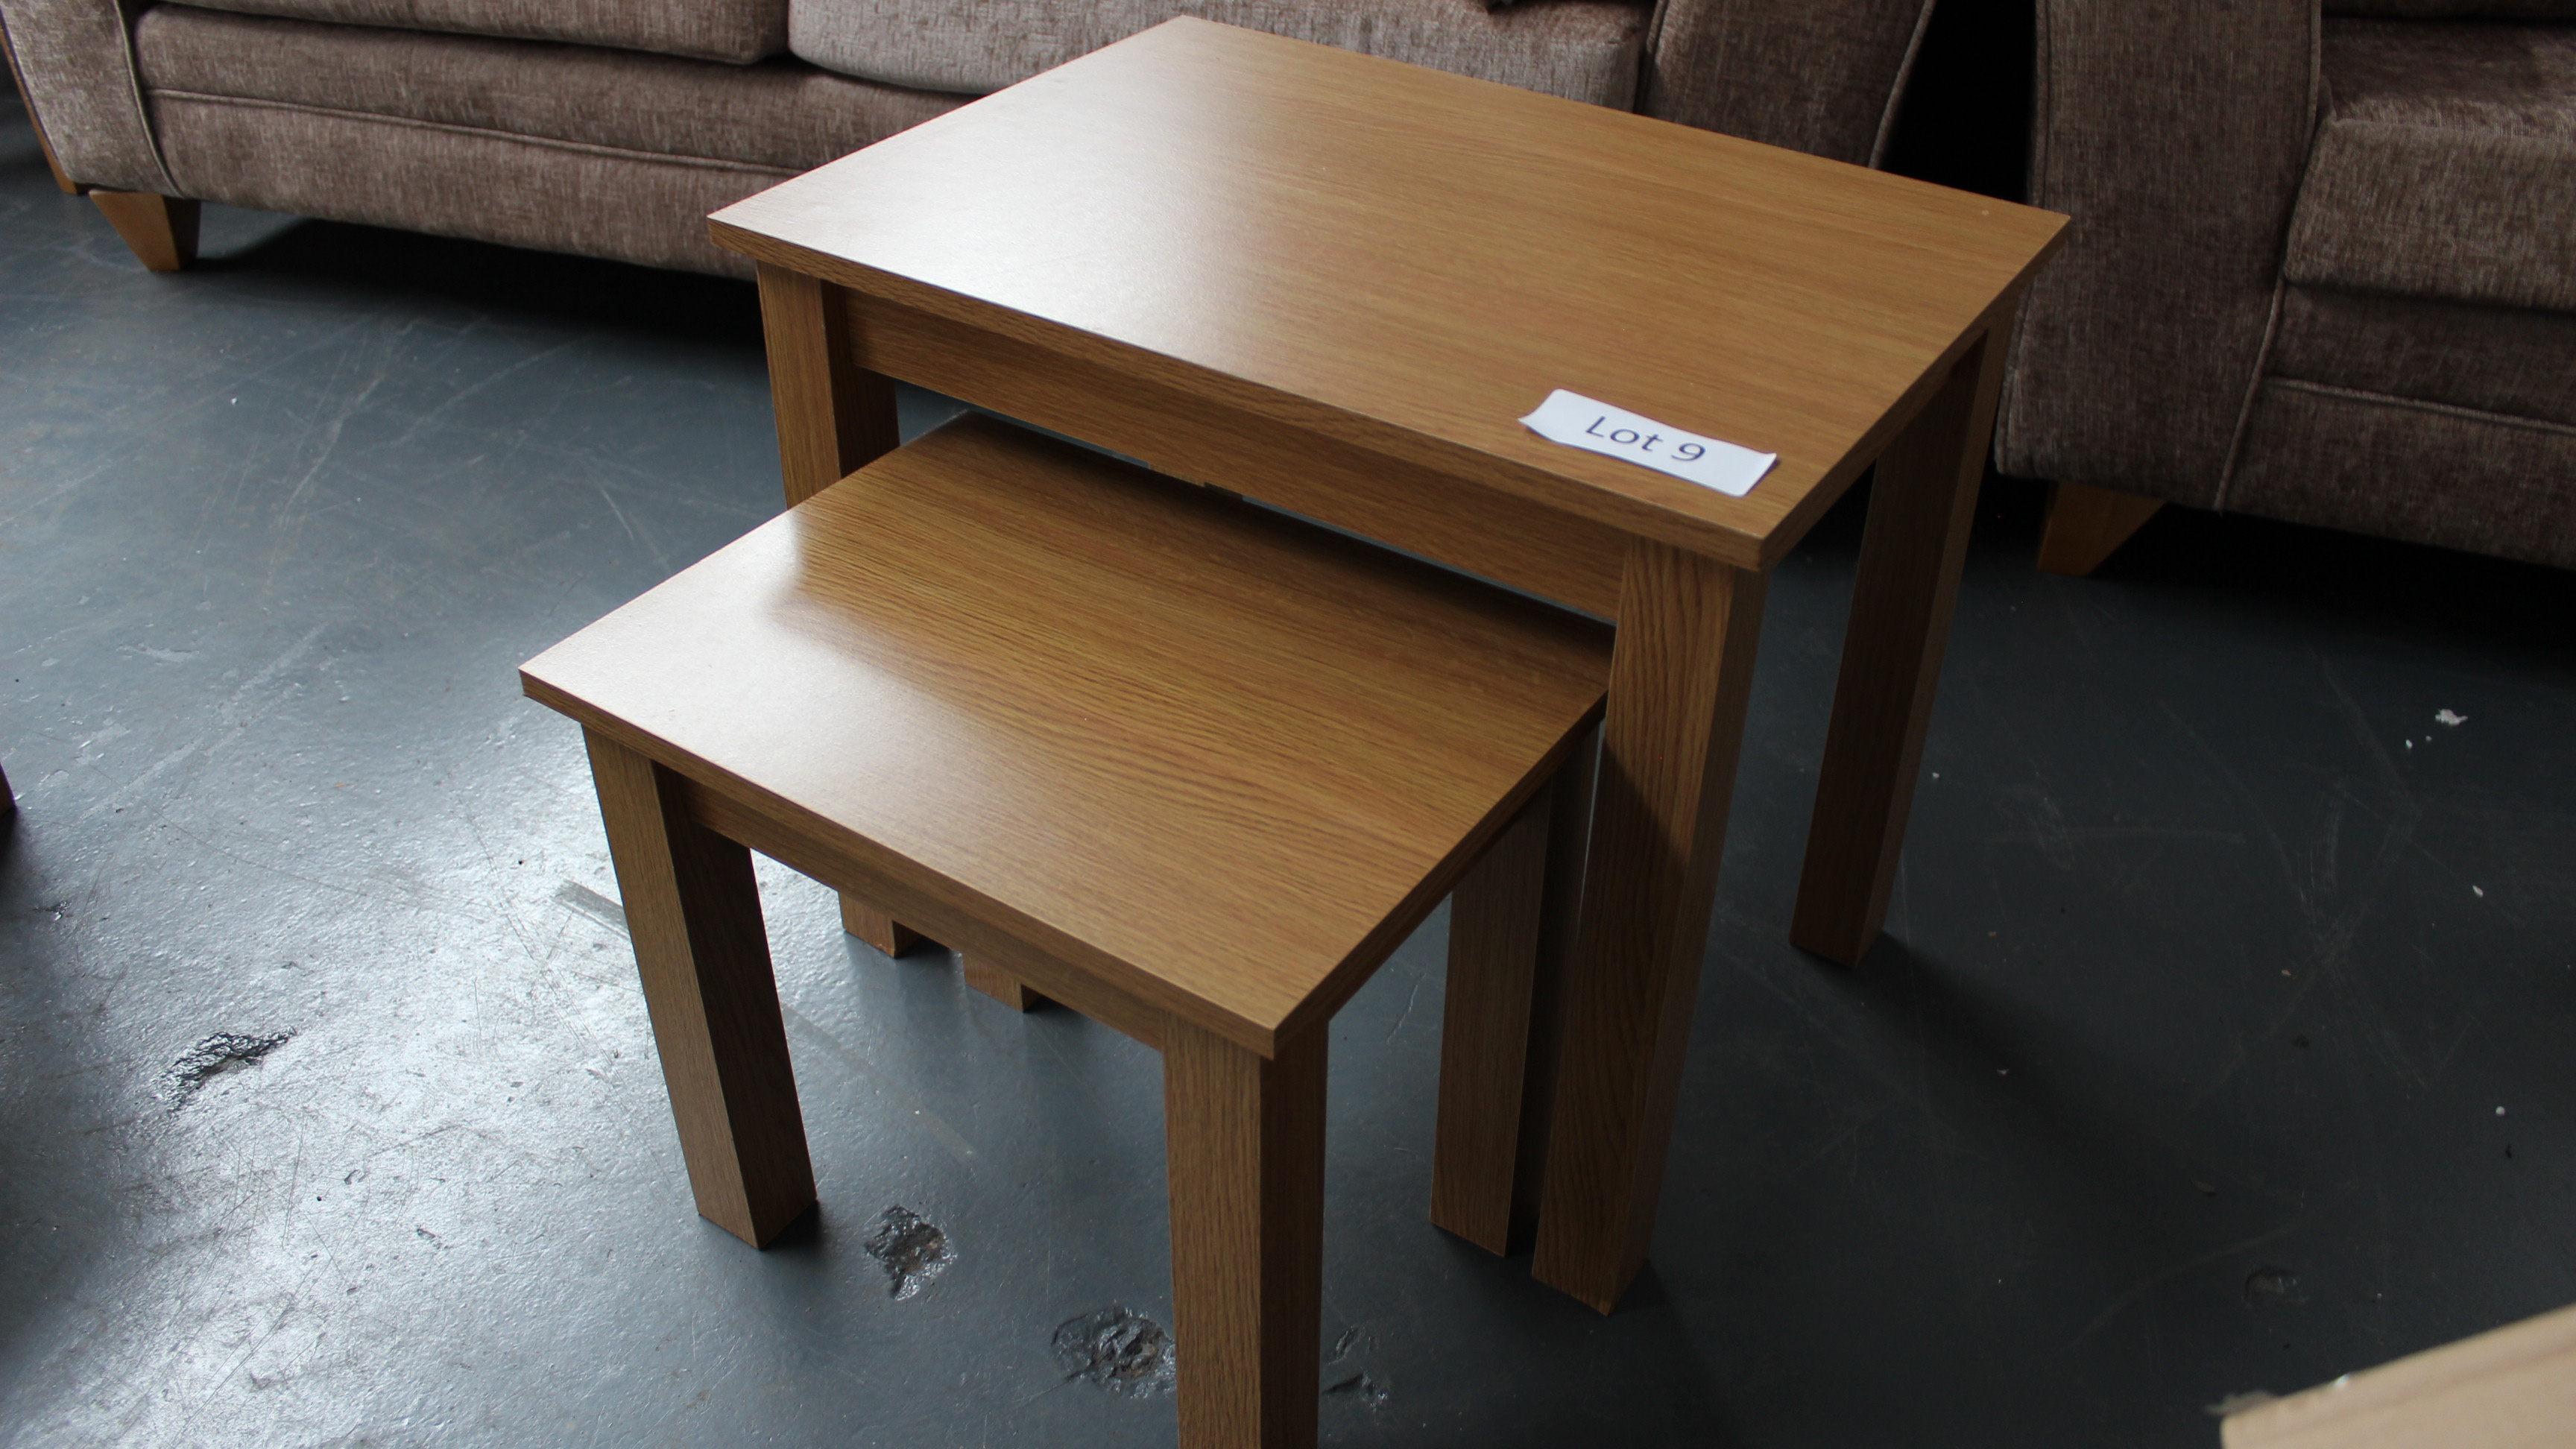 Lot 9 - Nest of 2 Wooden Tables Customer Returns